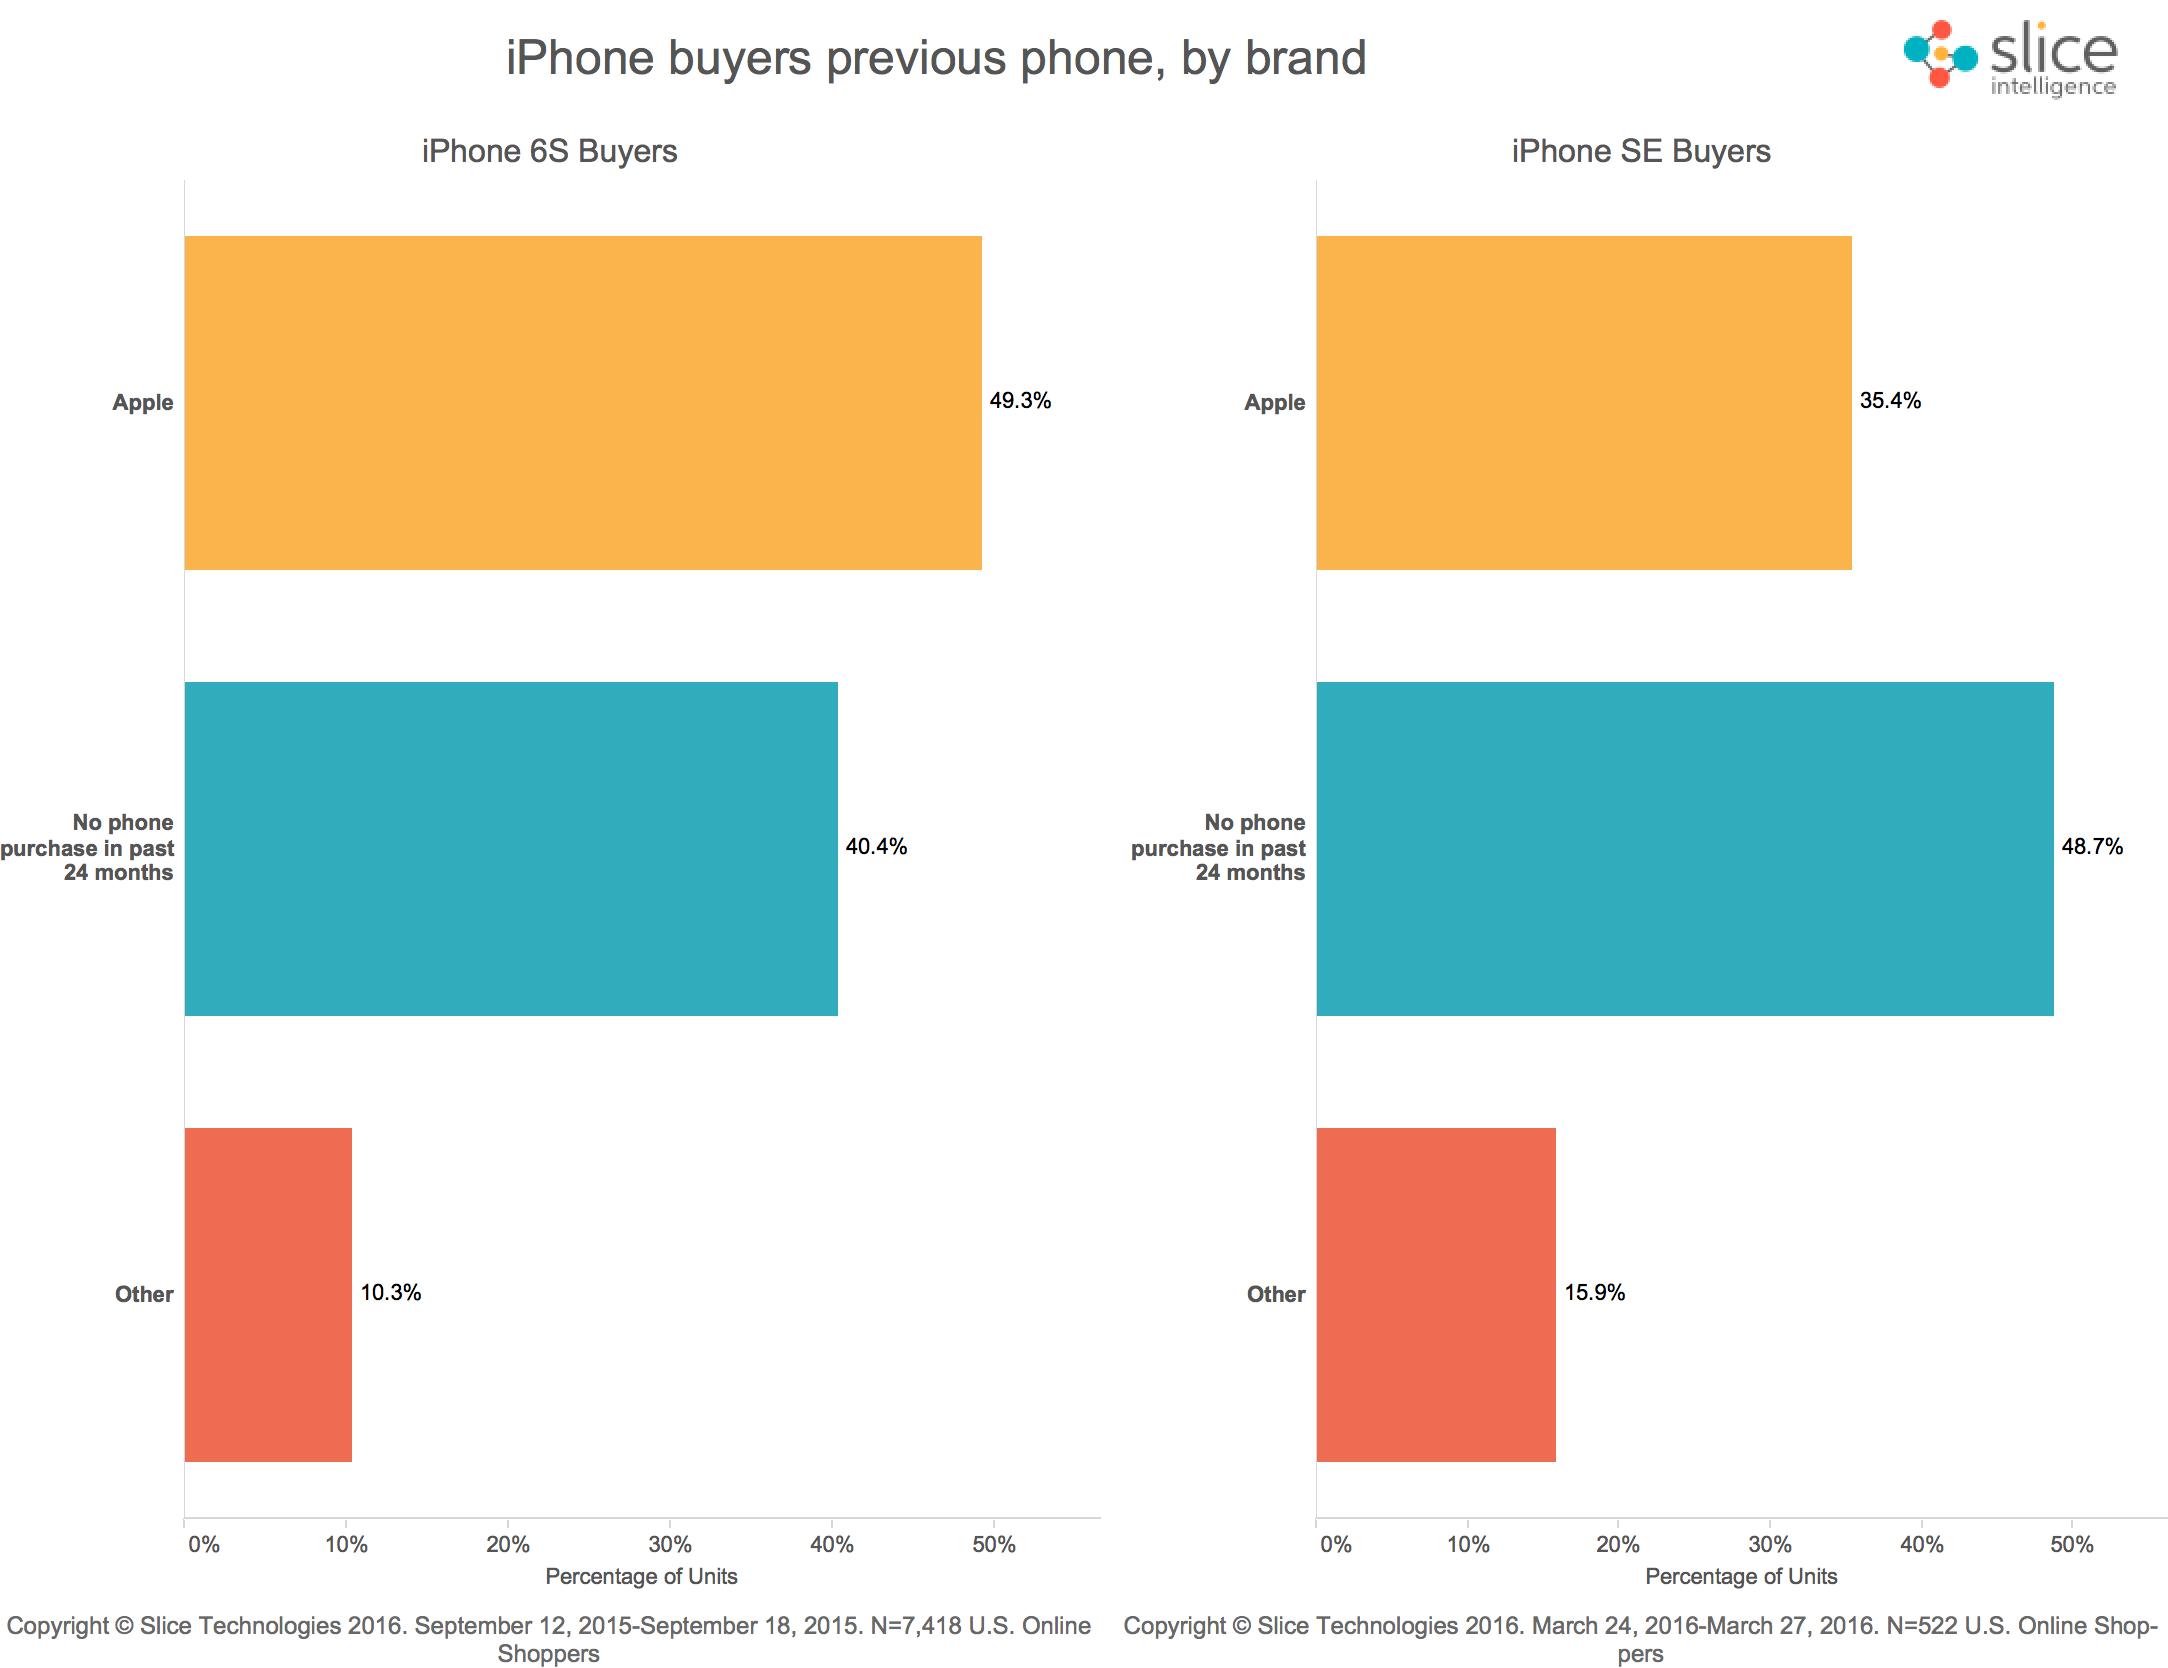 iPhone upgrade per model